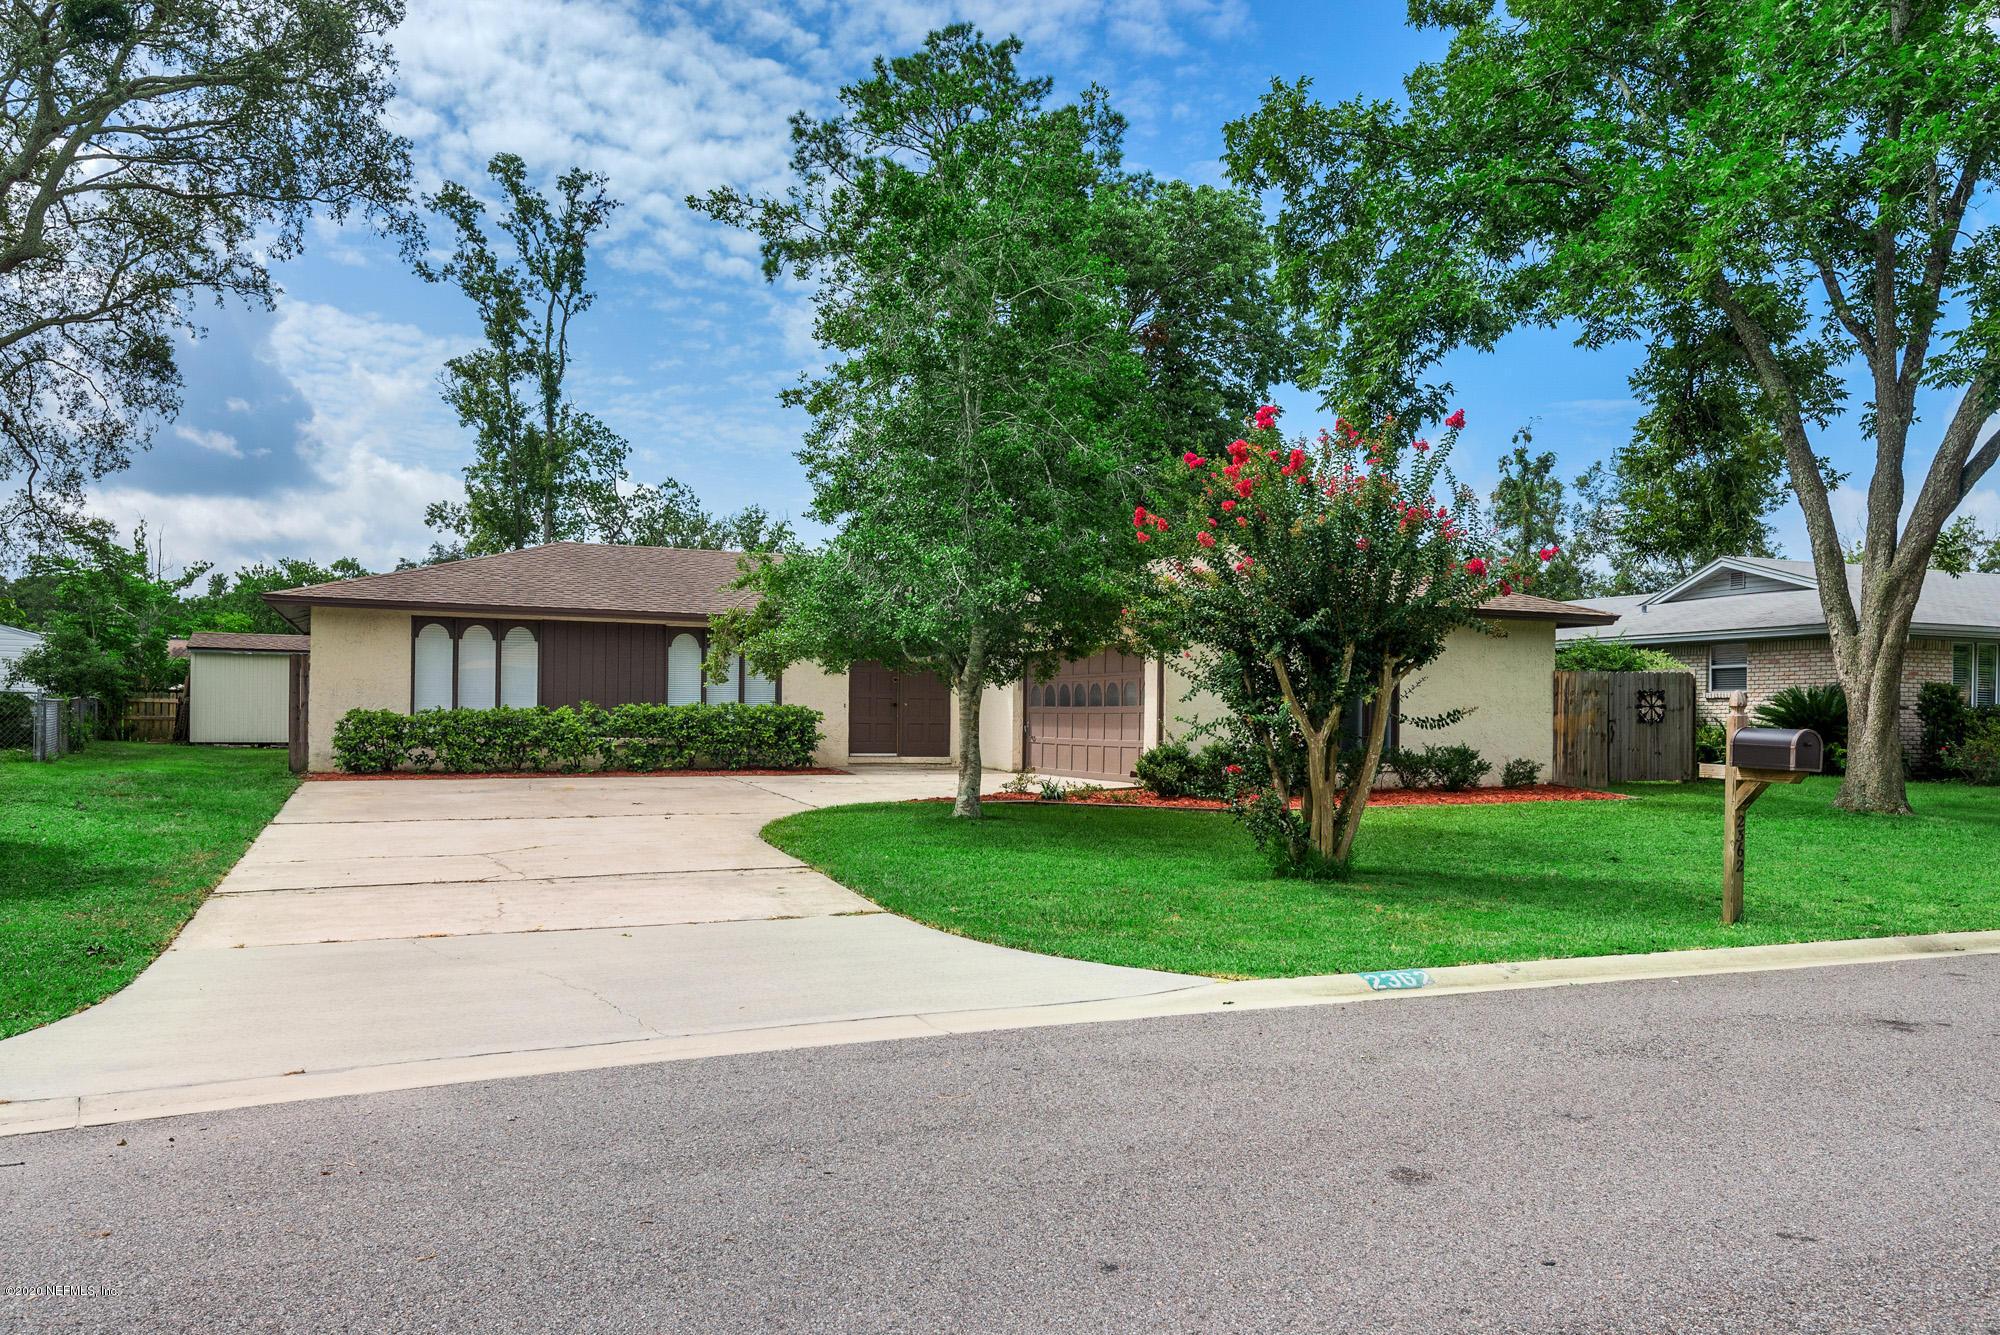 2362 GABRIEL, ORANGE PARK, FLORIDA 32073, 3 Bedrooms Bedrooms, ,2 BathroomsBathrooms,Residential,For sale,GABRIEL,1066094